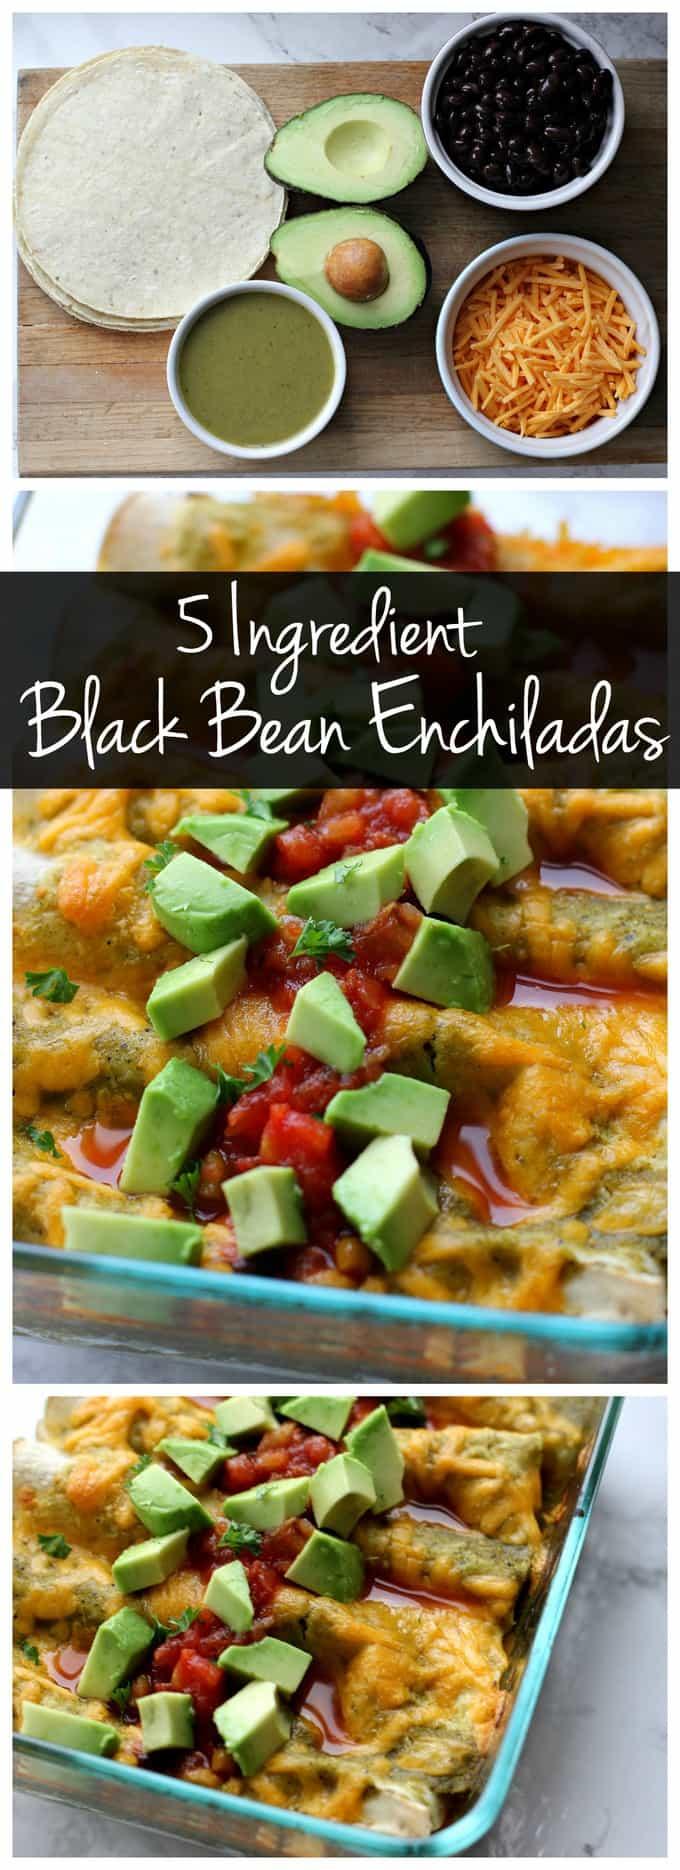 5 Ingredient Black Bean Enchiladas